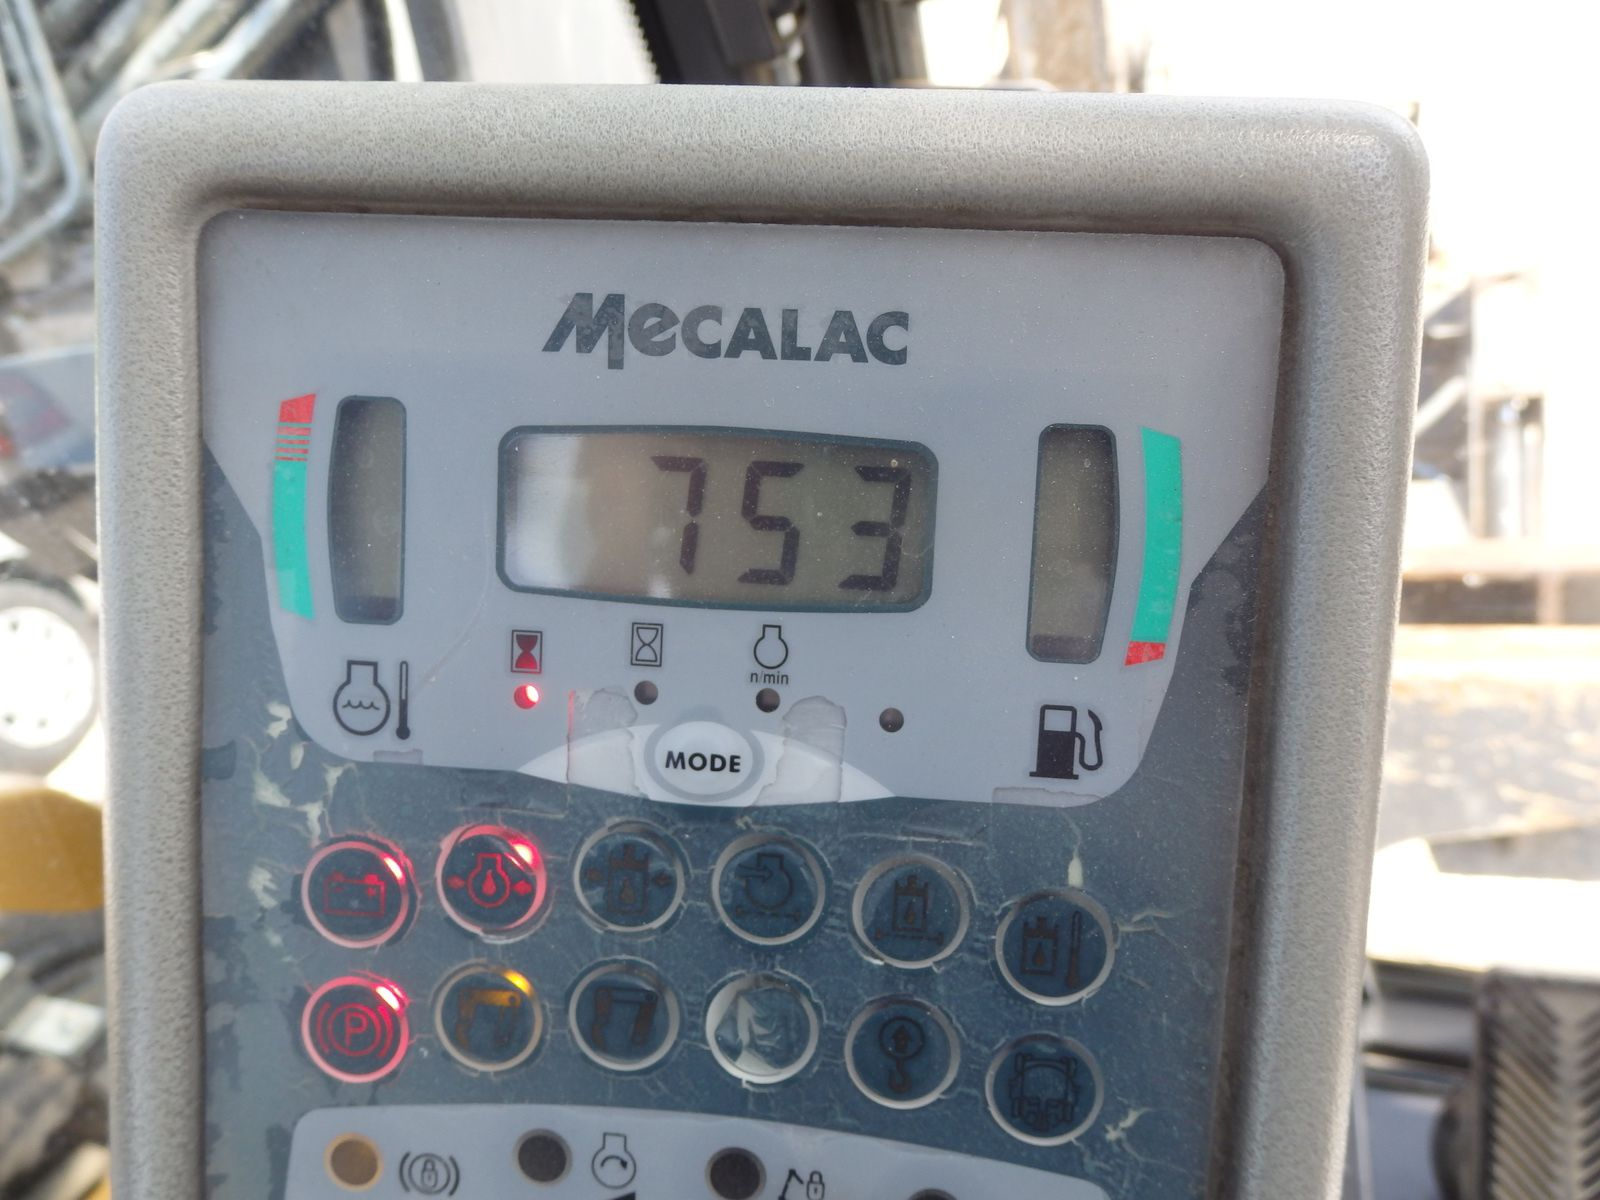 MECALAC 12 MSX Tel: 0608066192 Pierre BASSAT TRANSCOMM13